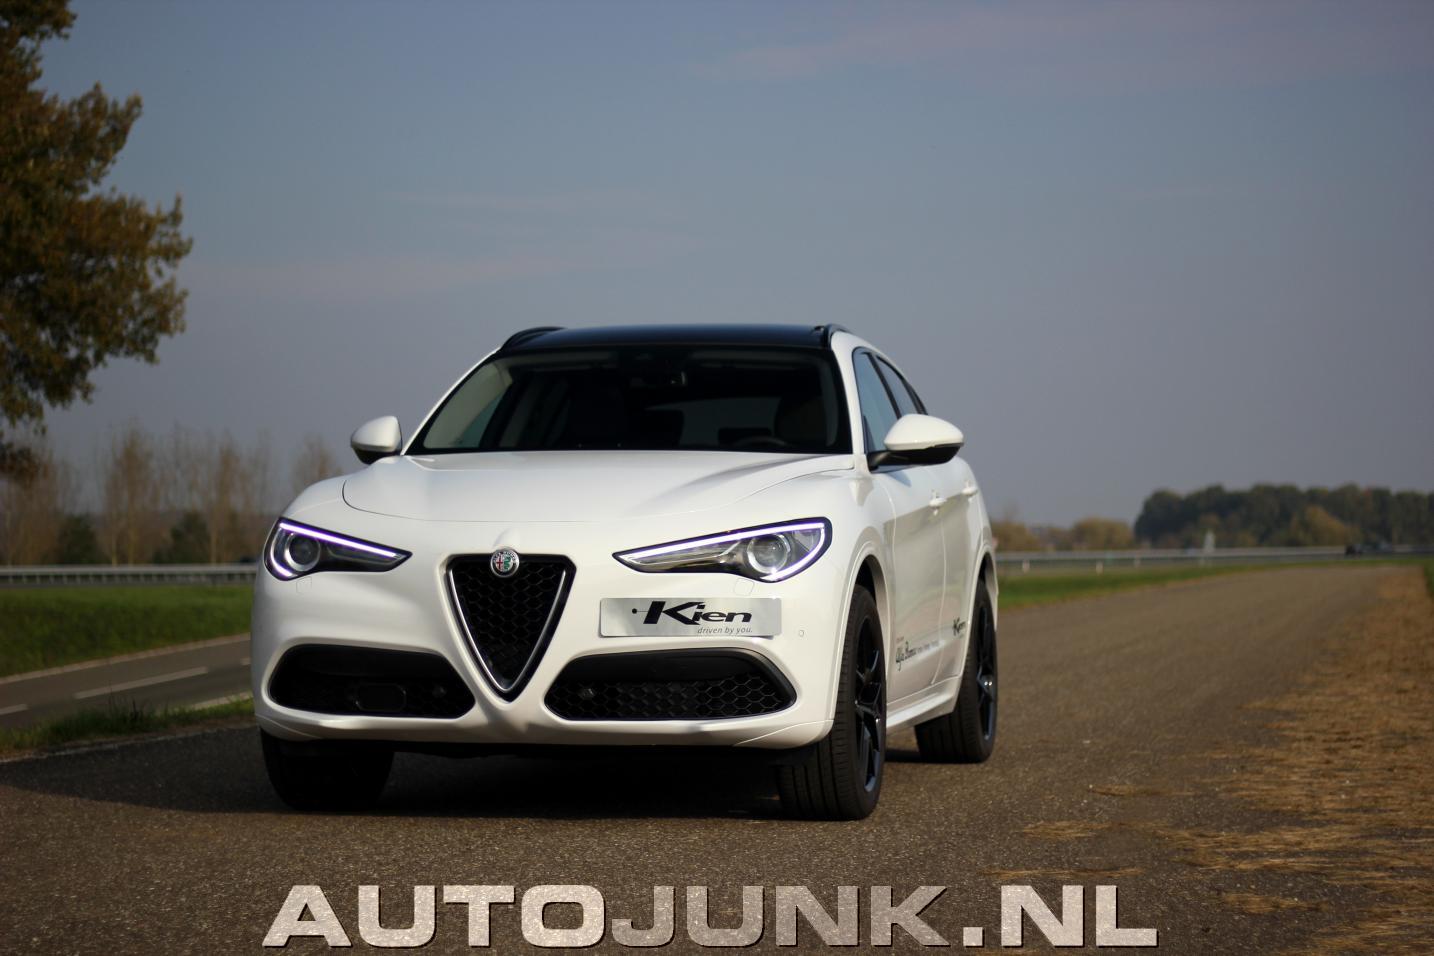 Alfa Romeo Stelvio Foto S Autojunk Nl 207957